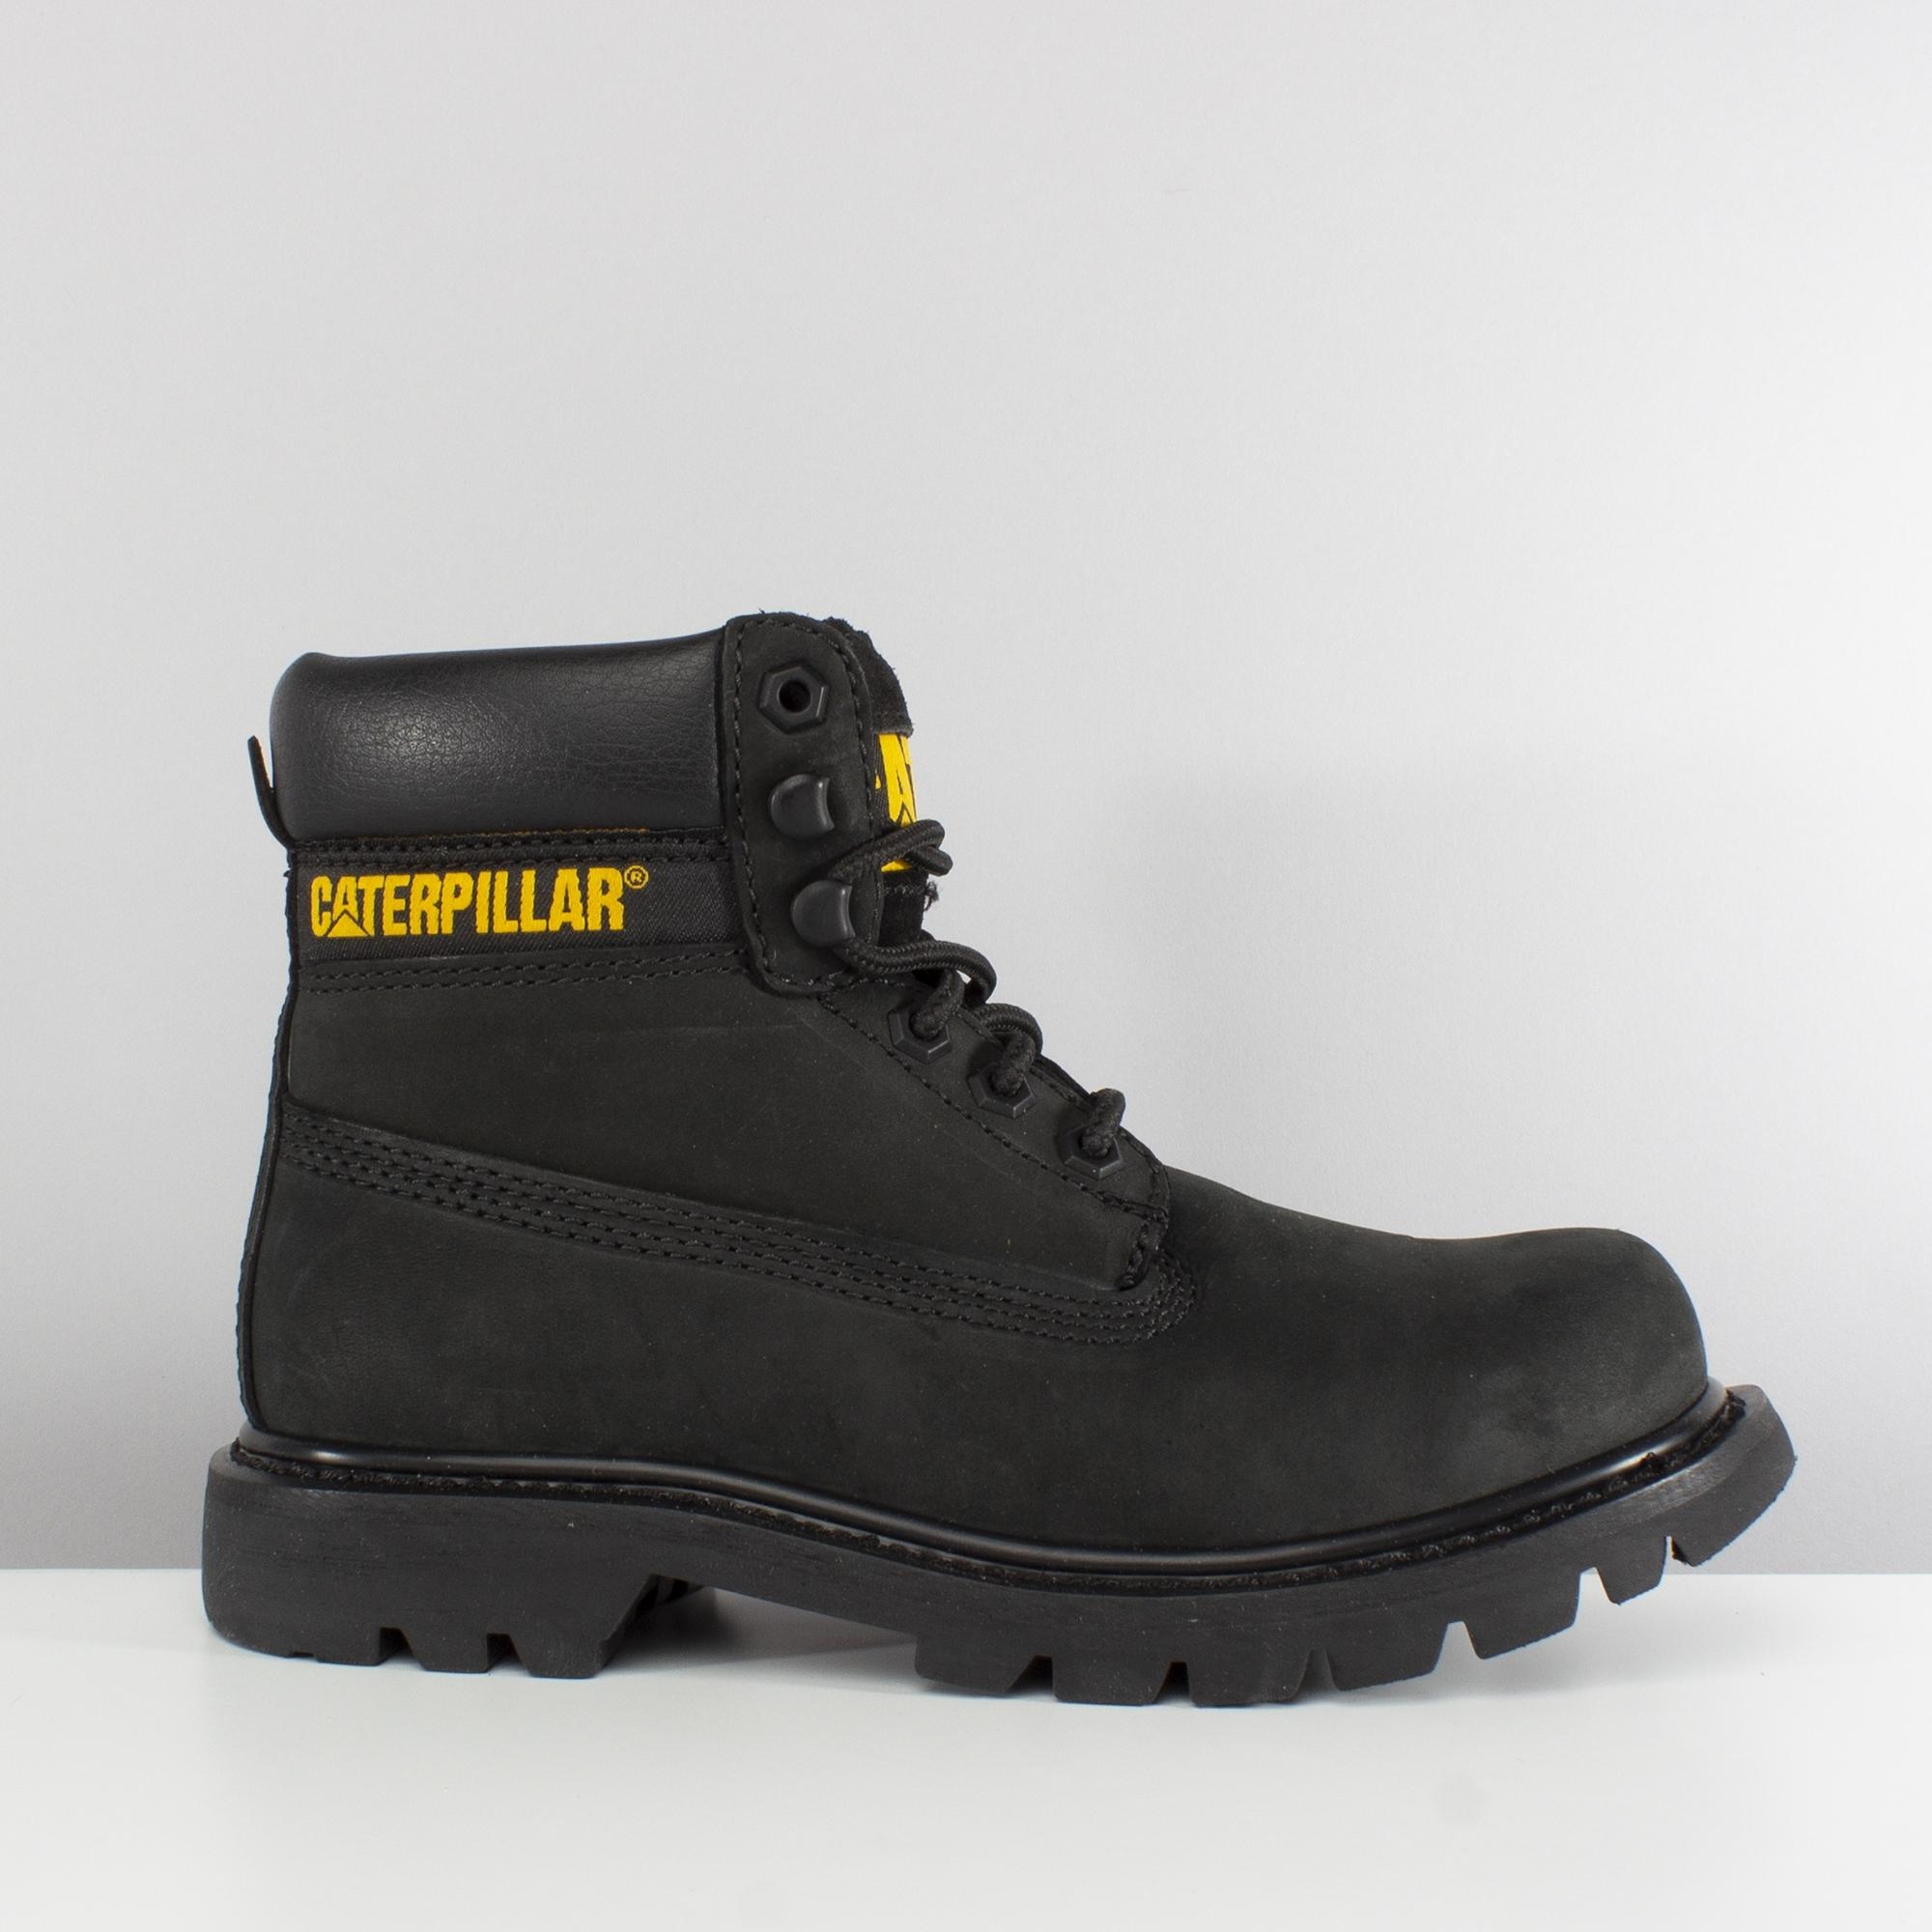 CAT Lifestyle COLORADO Ladies Real Leather Ankle Boots Black  6e2d9e8181